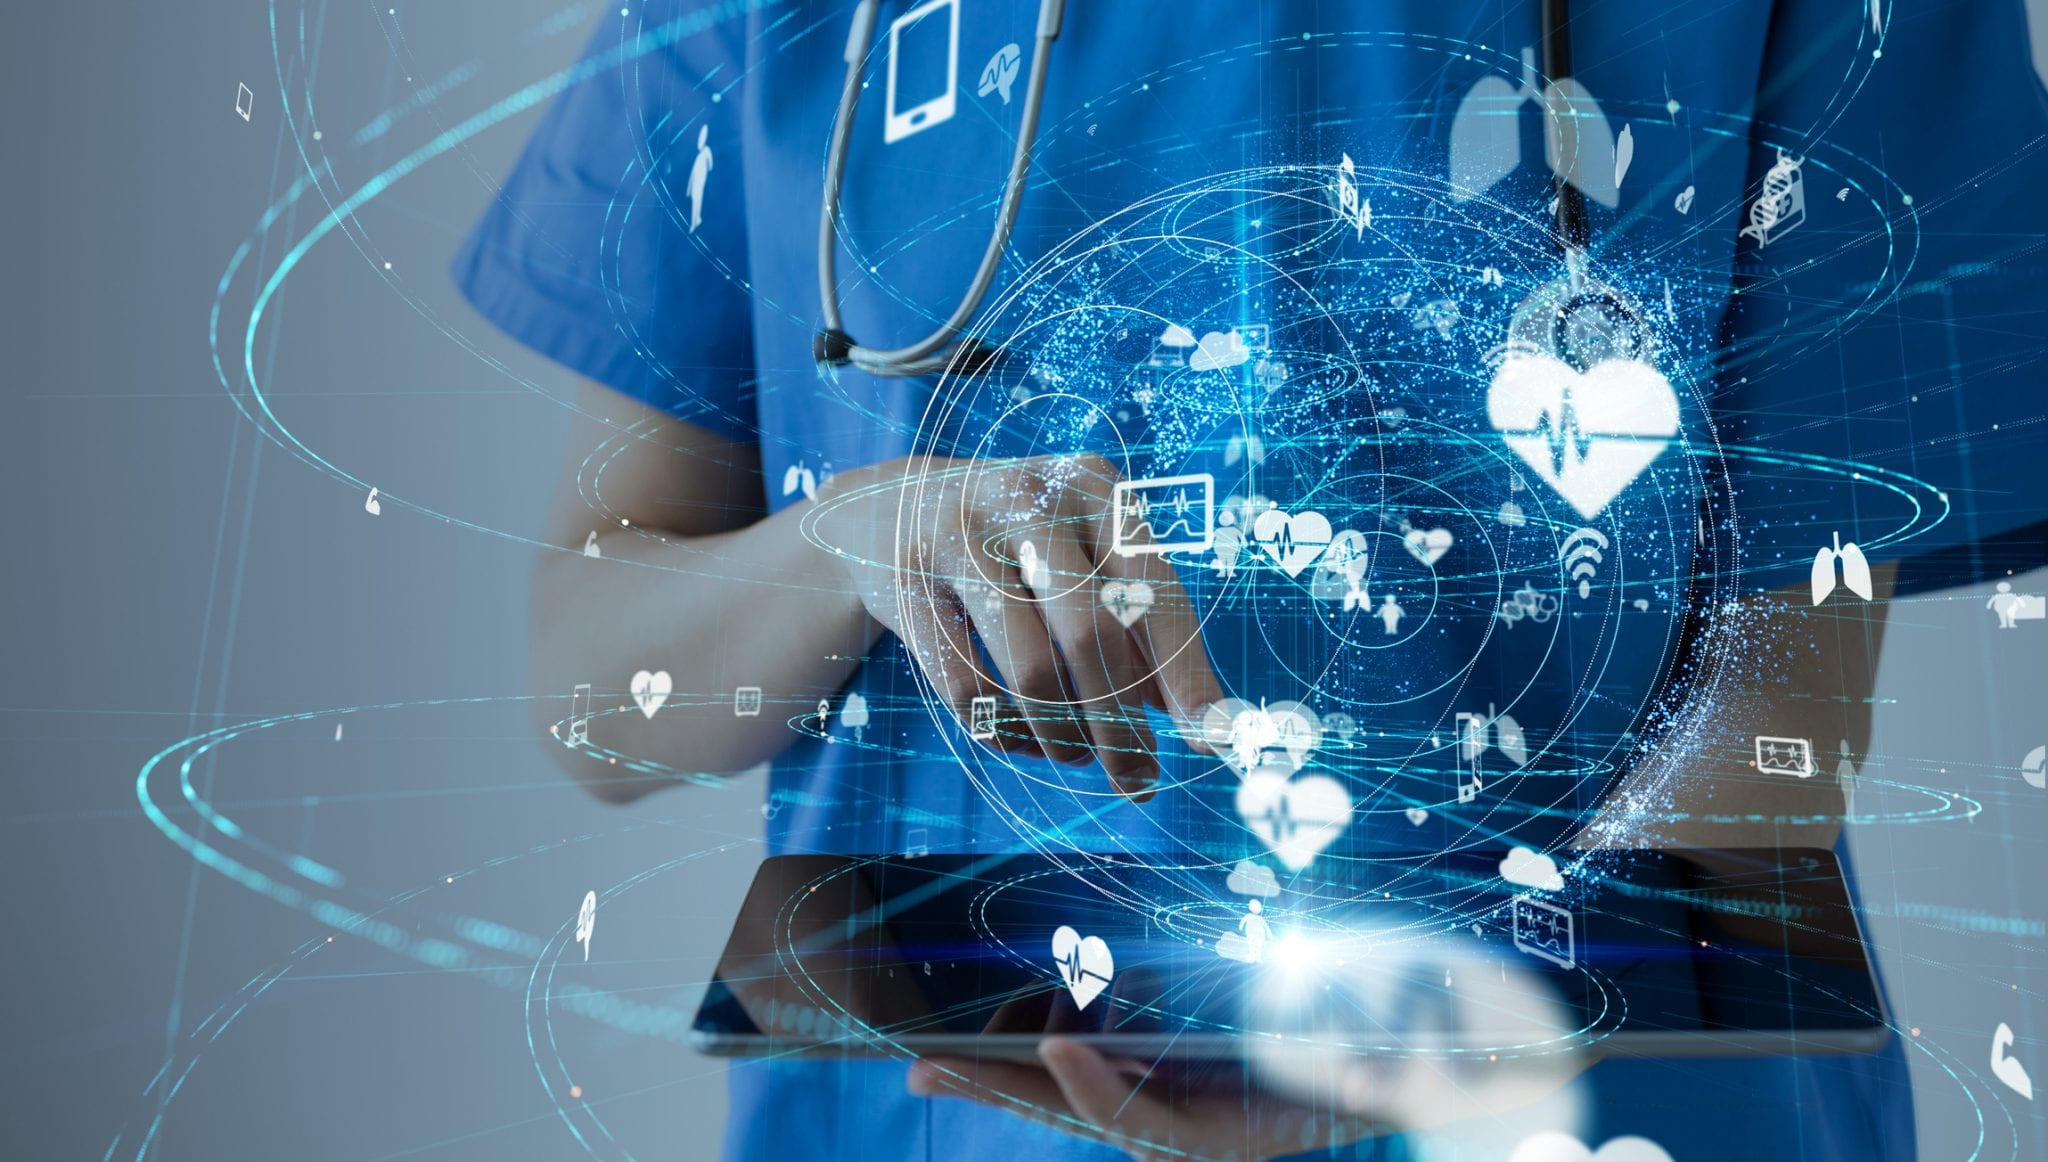 medical professional using ipad